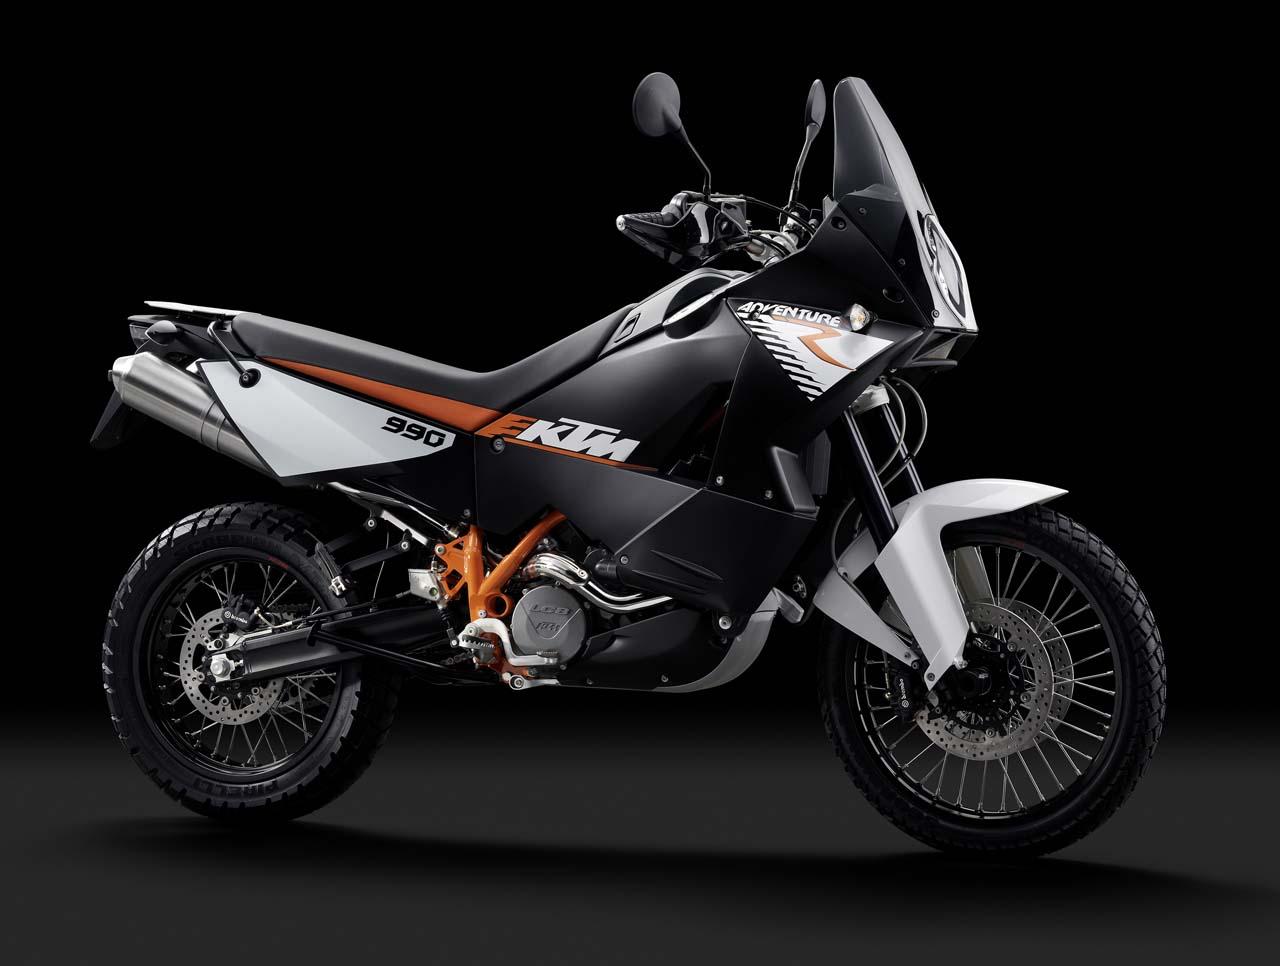 Motor Seri Ktm 990 Adventure R Motor Modif Contest